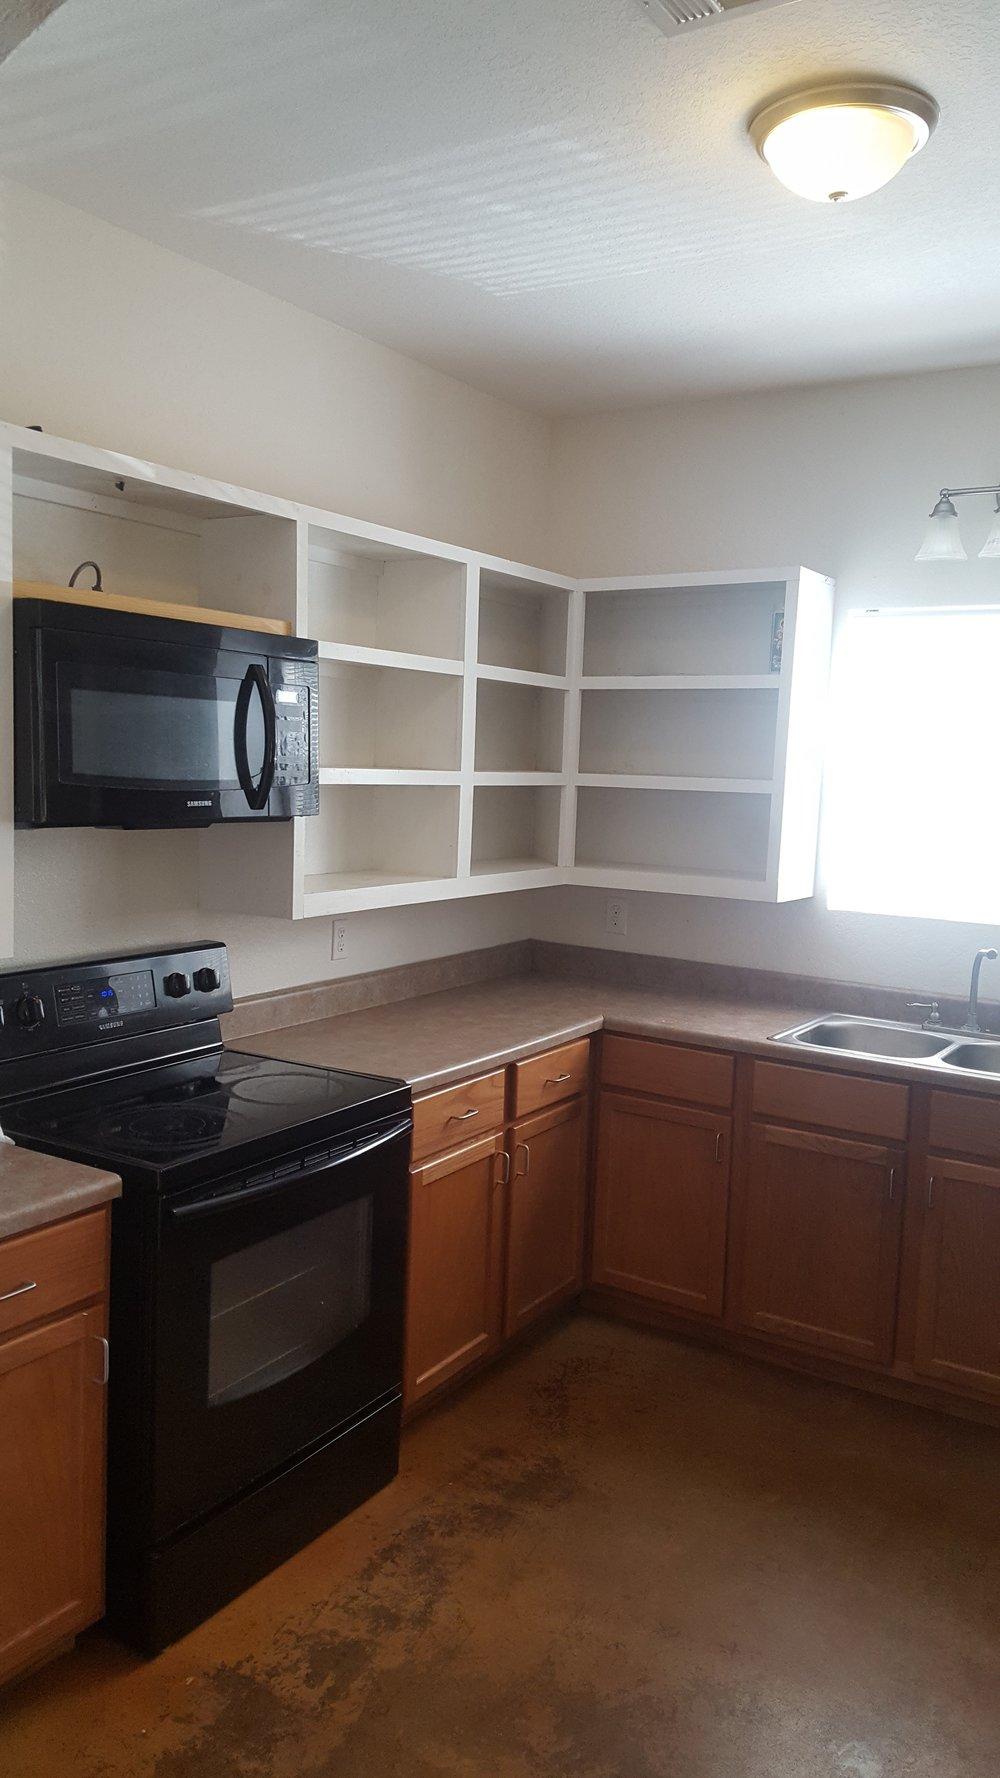 jones 1112 kitchen 3.jpg